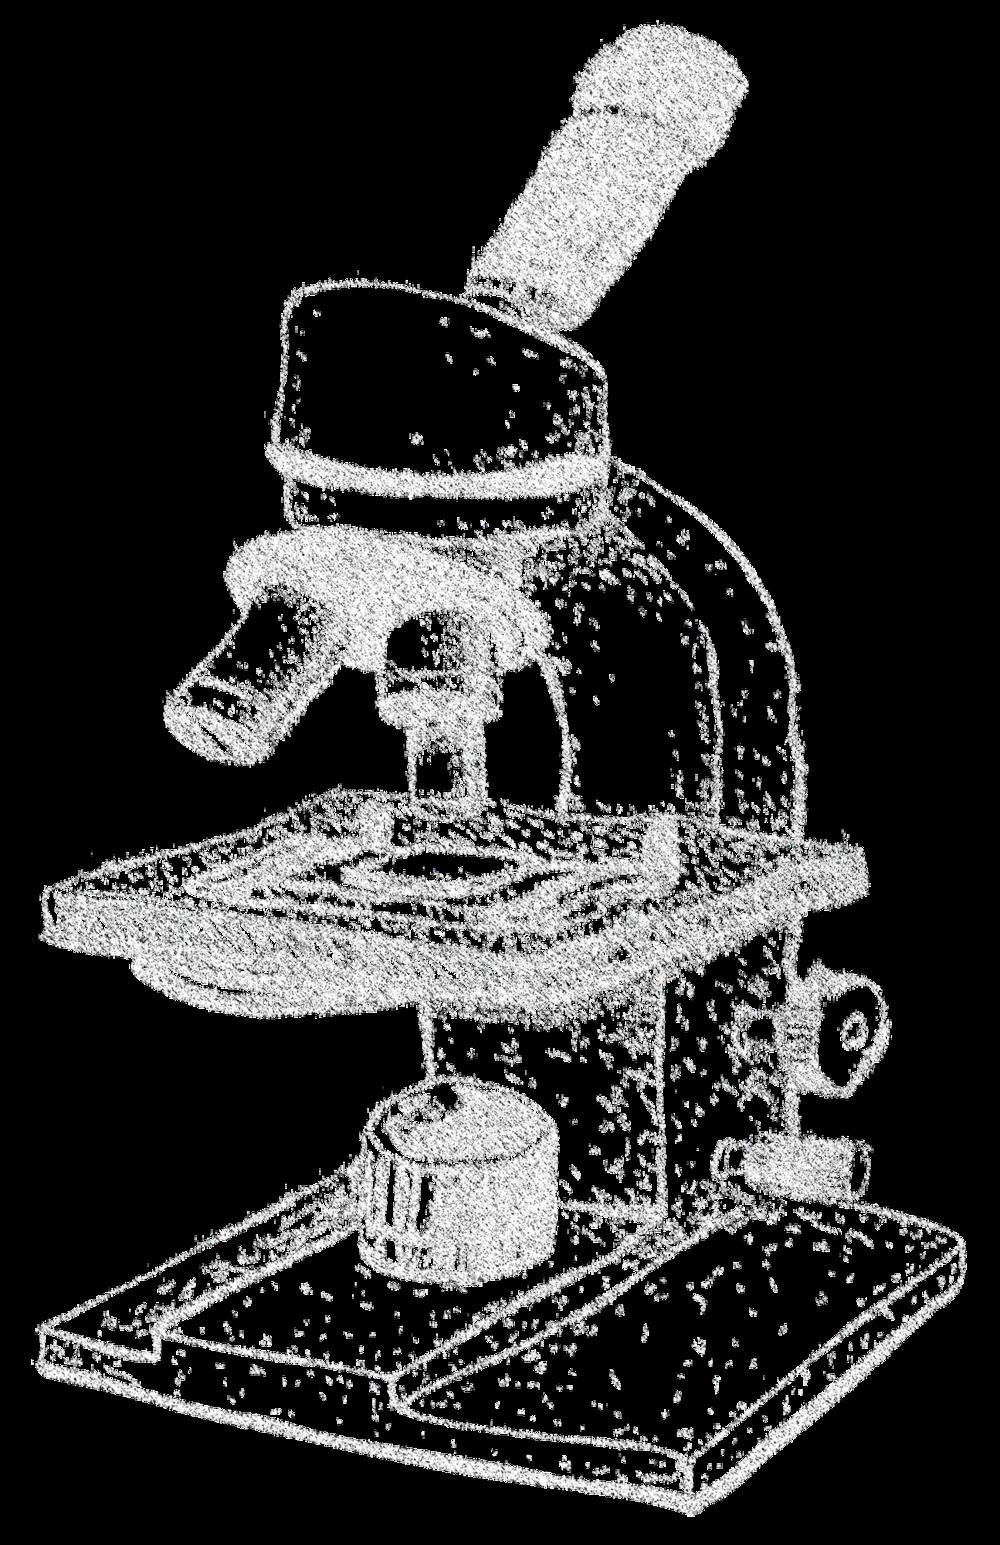 microscope pic